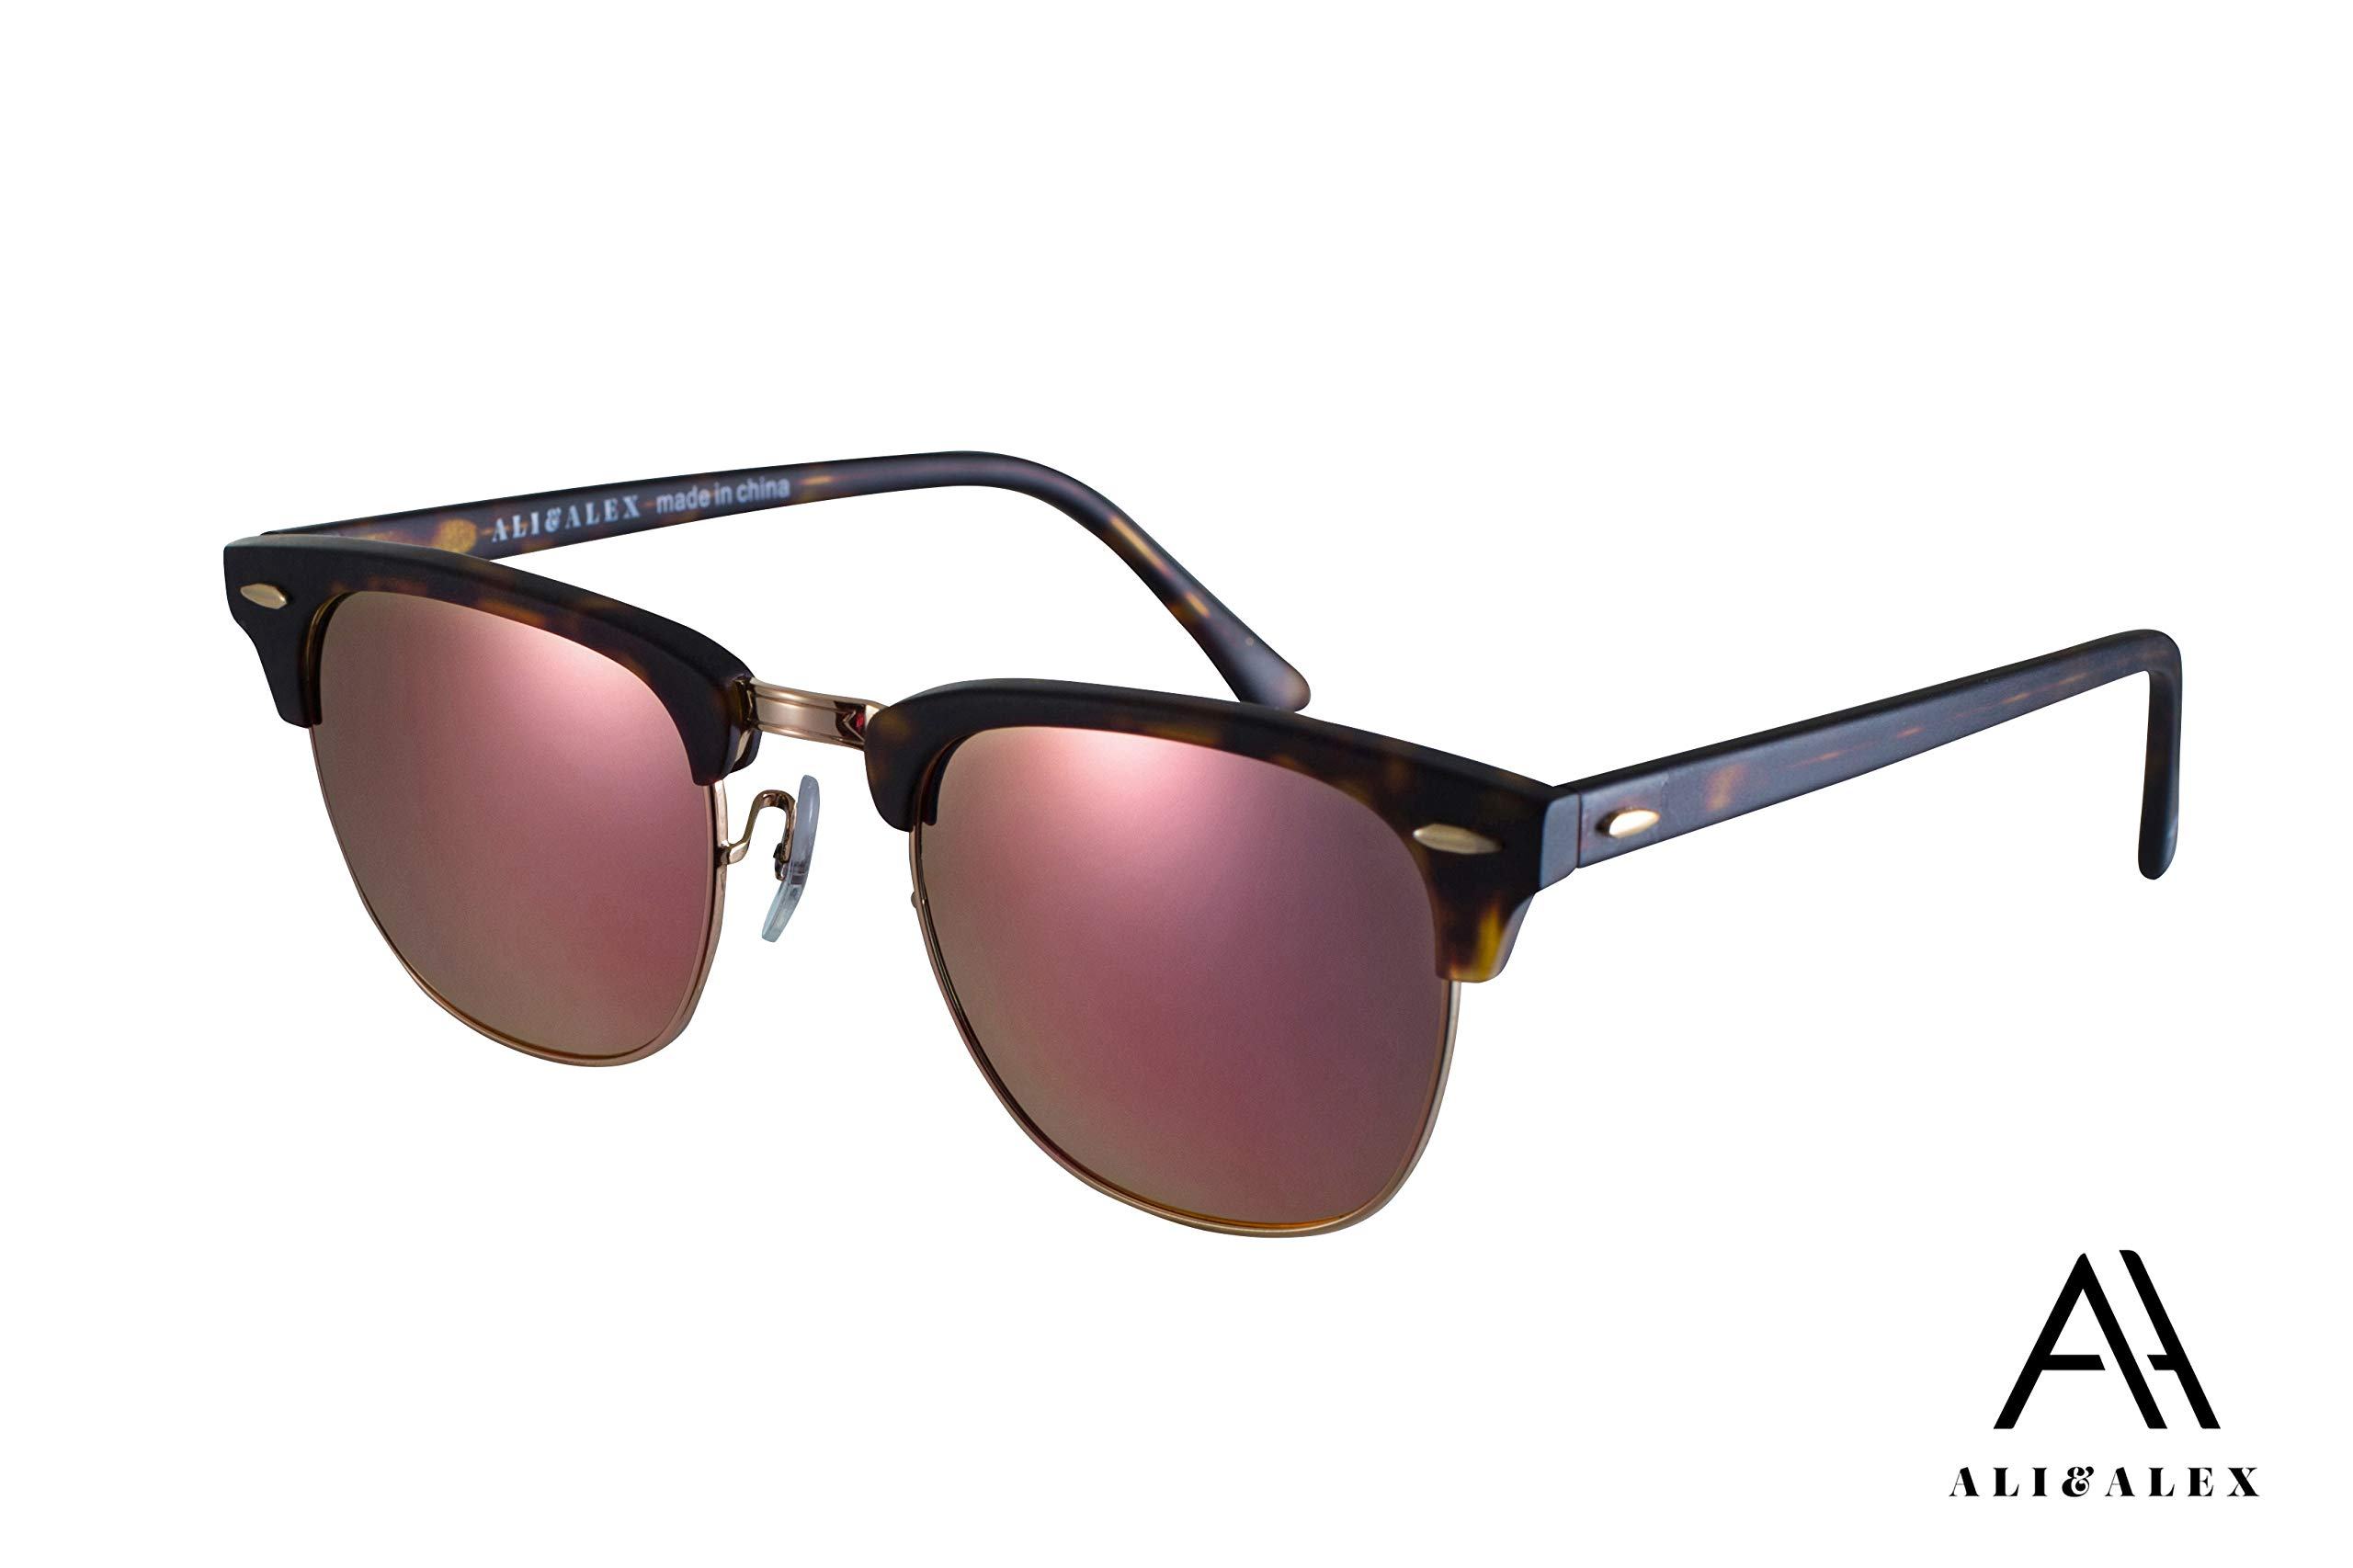 Ali&Alex Jamie Clubmaster Semi Rimless UV Polarized Adult Designer Sunglasses for Men & Women by Ali&Alex